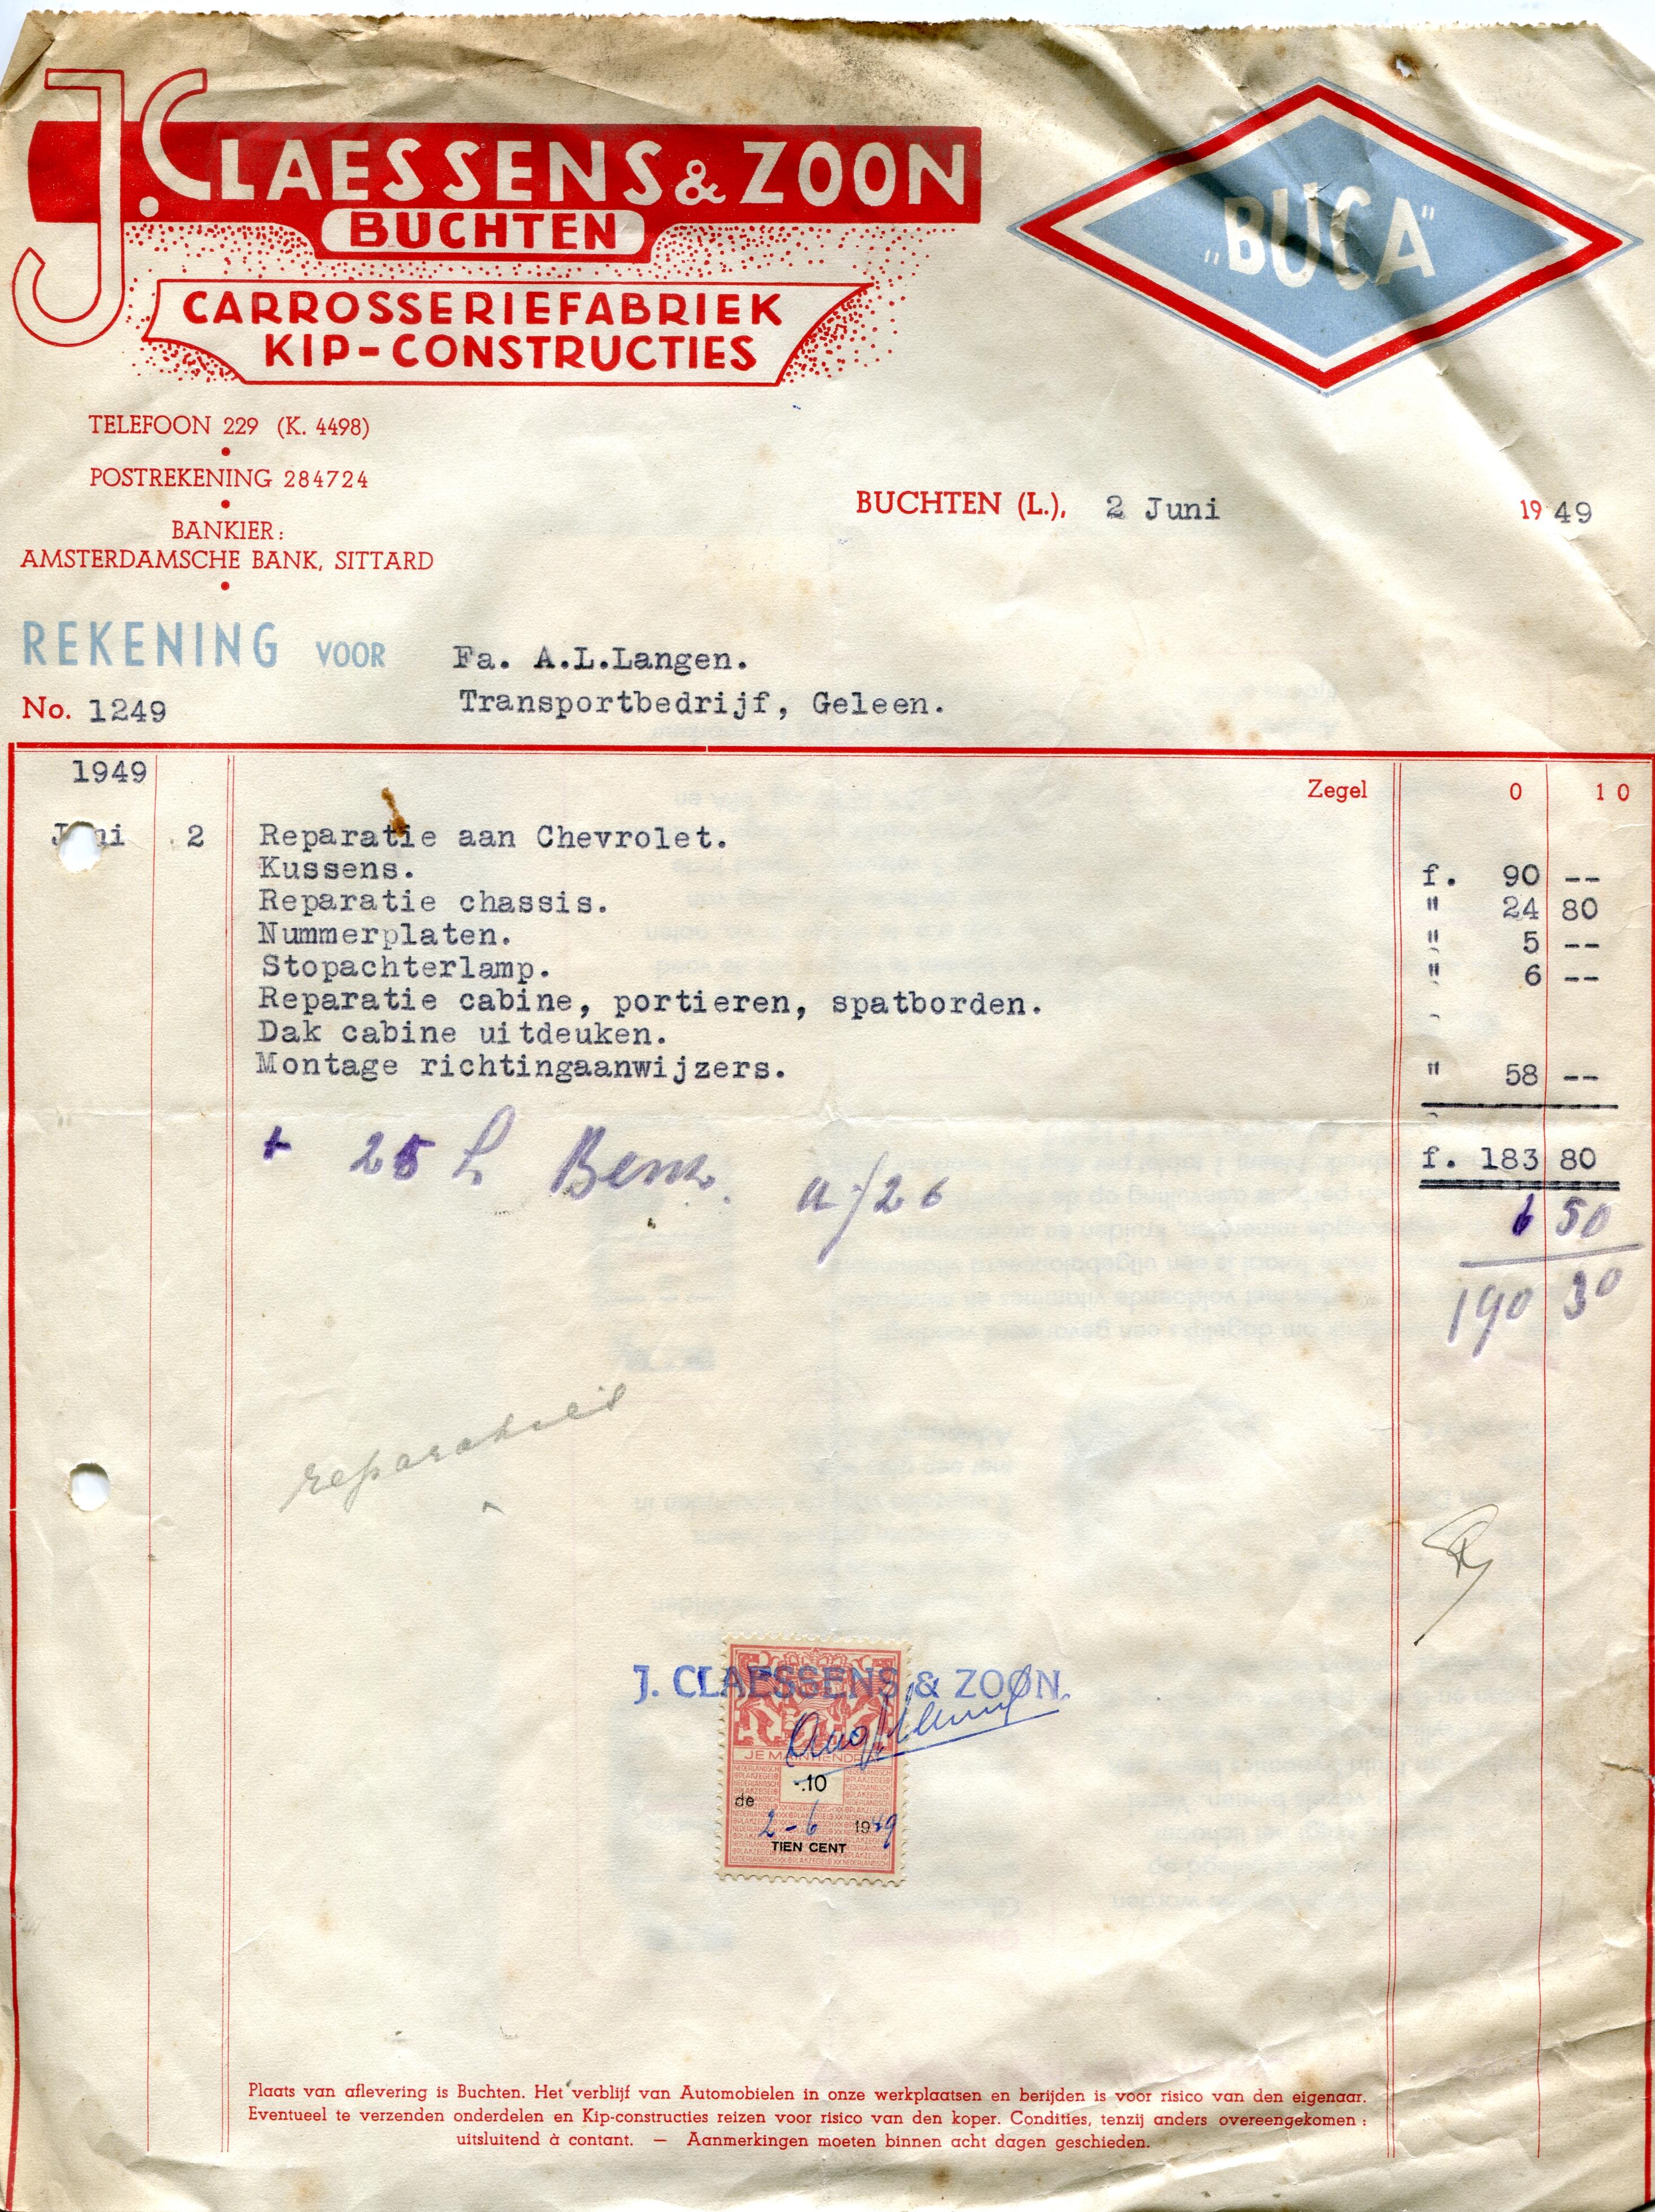 1949-Buca-carr-1